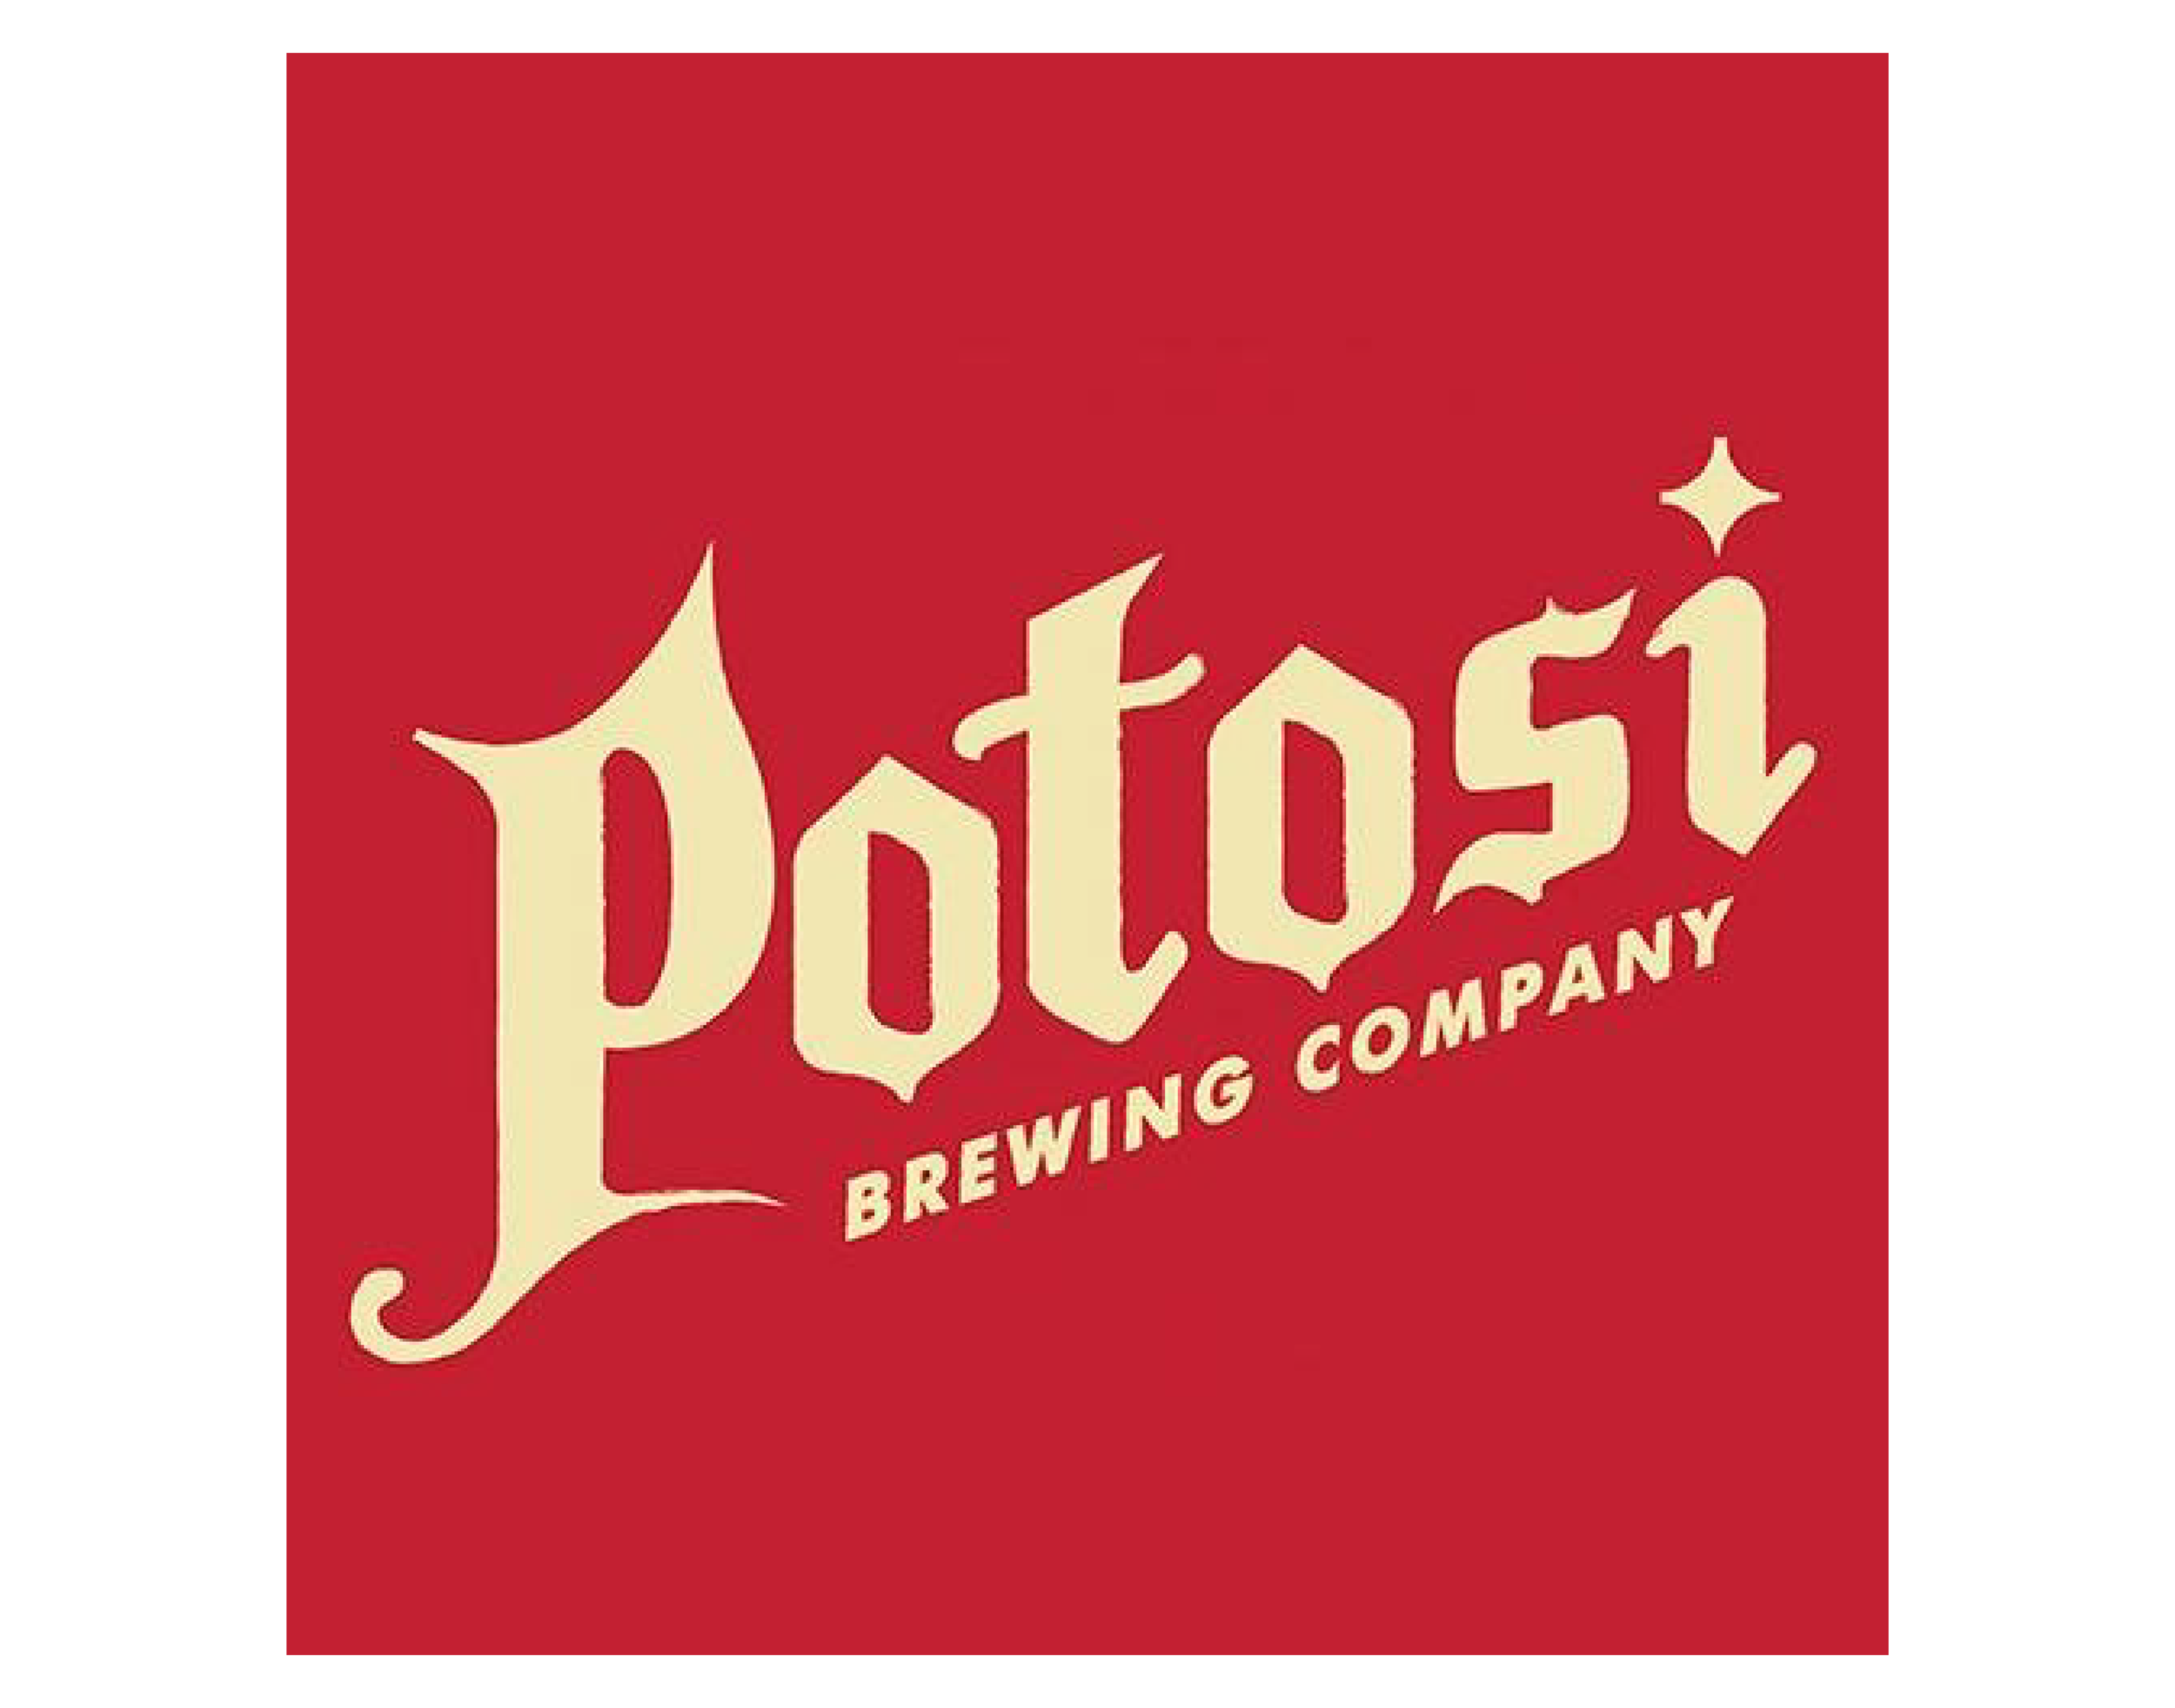 Potosi Brewing Company logo. Links to Potosi Brewing Company website.